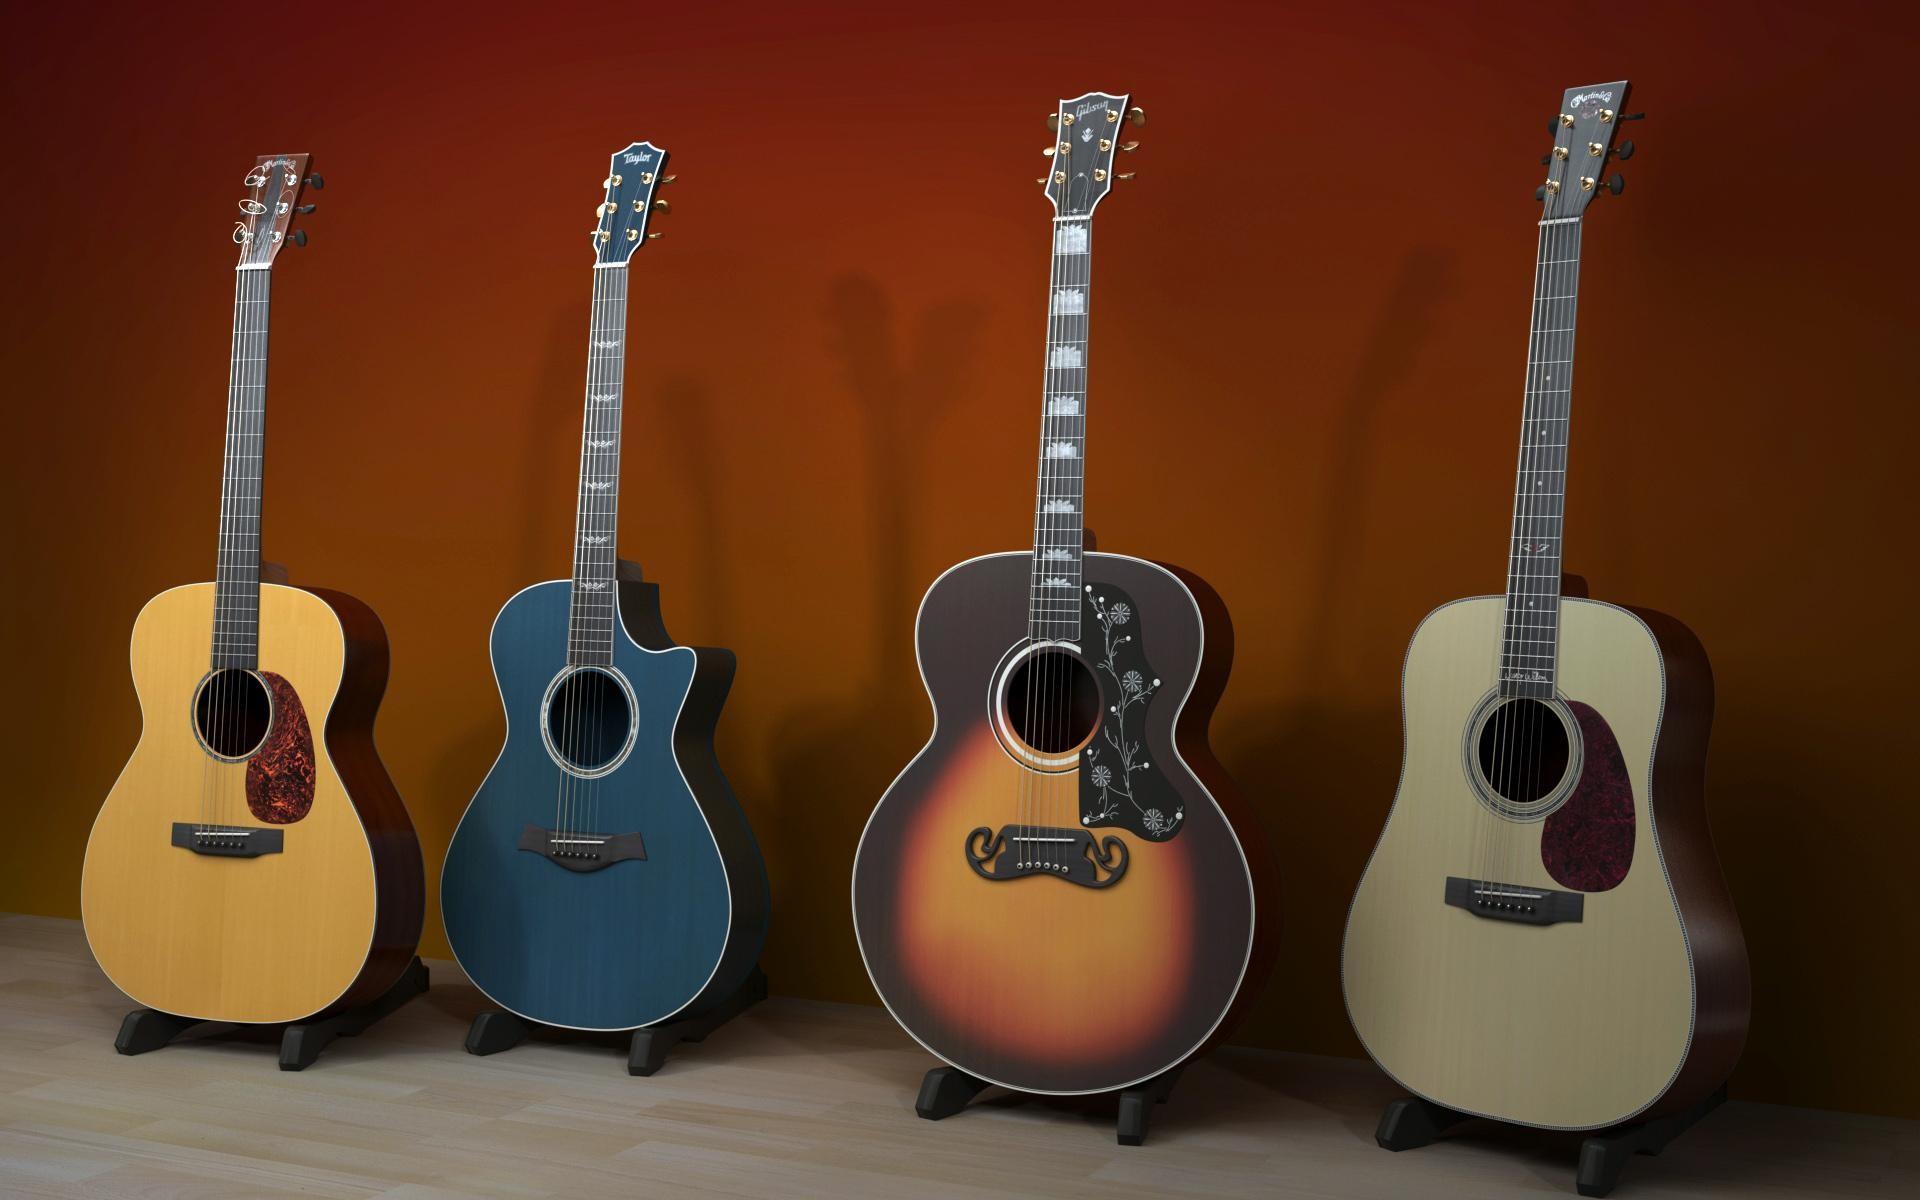 Screen-Guitar-Wallpapers-Photo